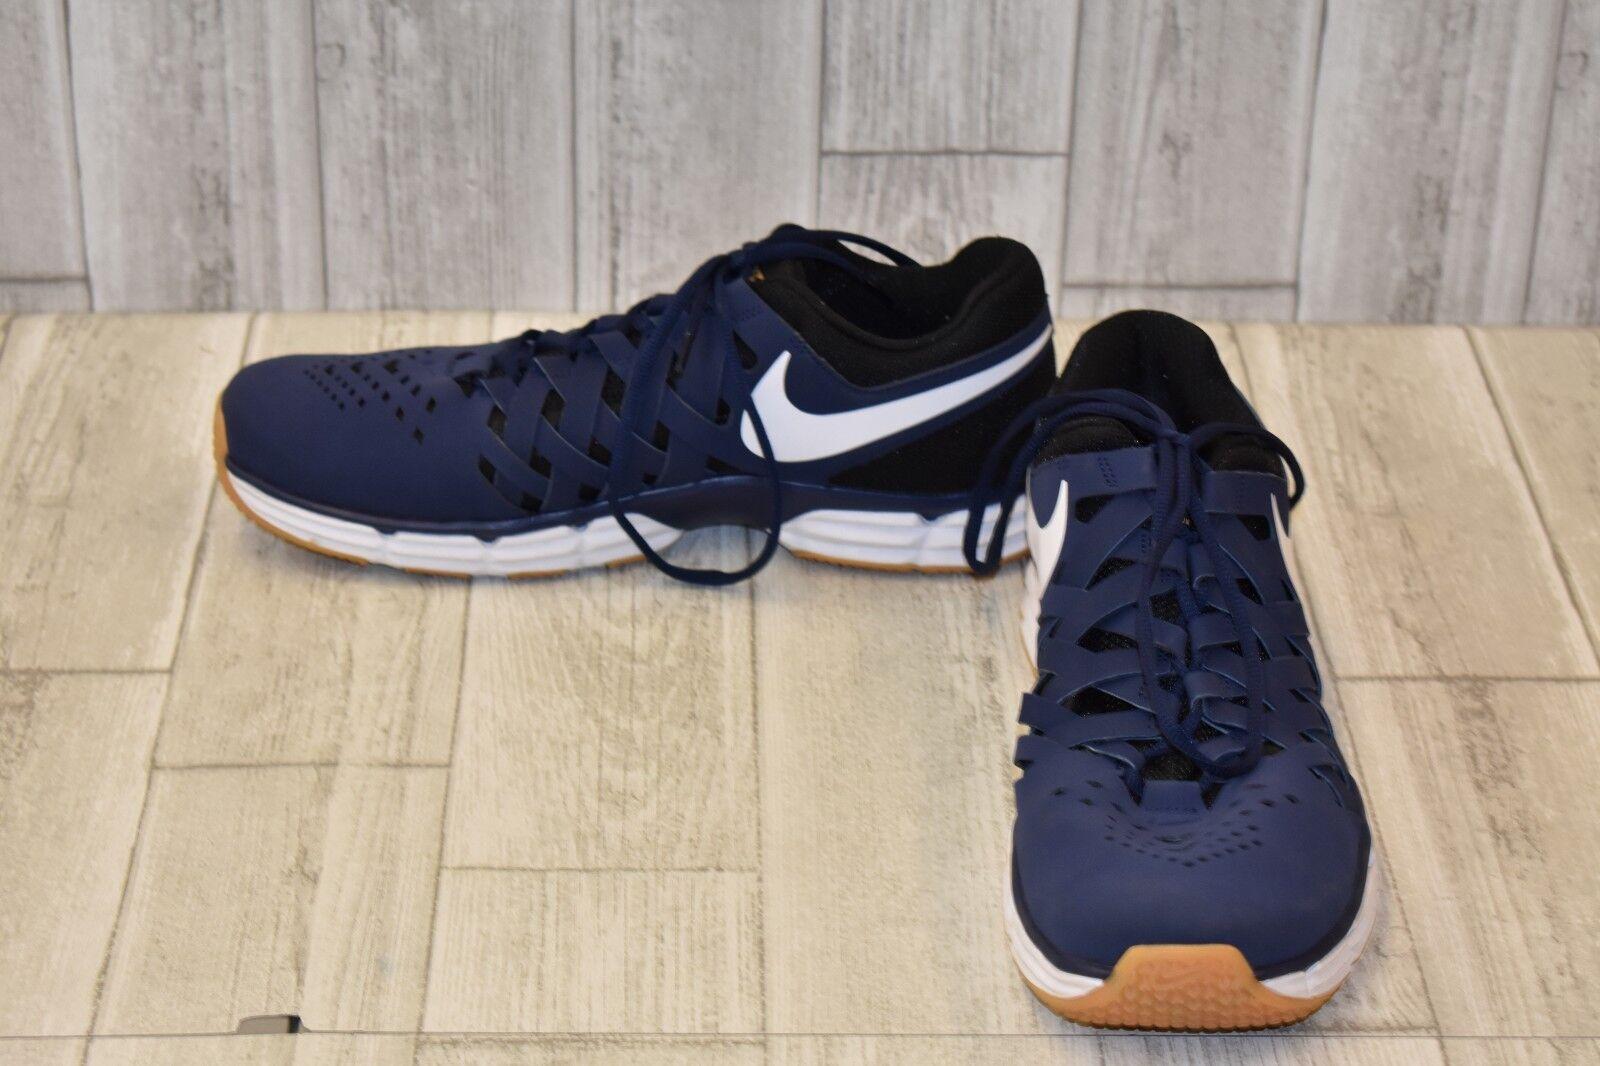 Nike Lunar Fingertrap Gym Shoes-Men's size 12.5 Navy